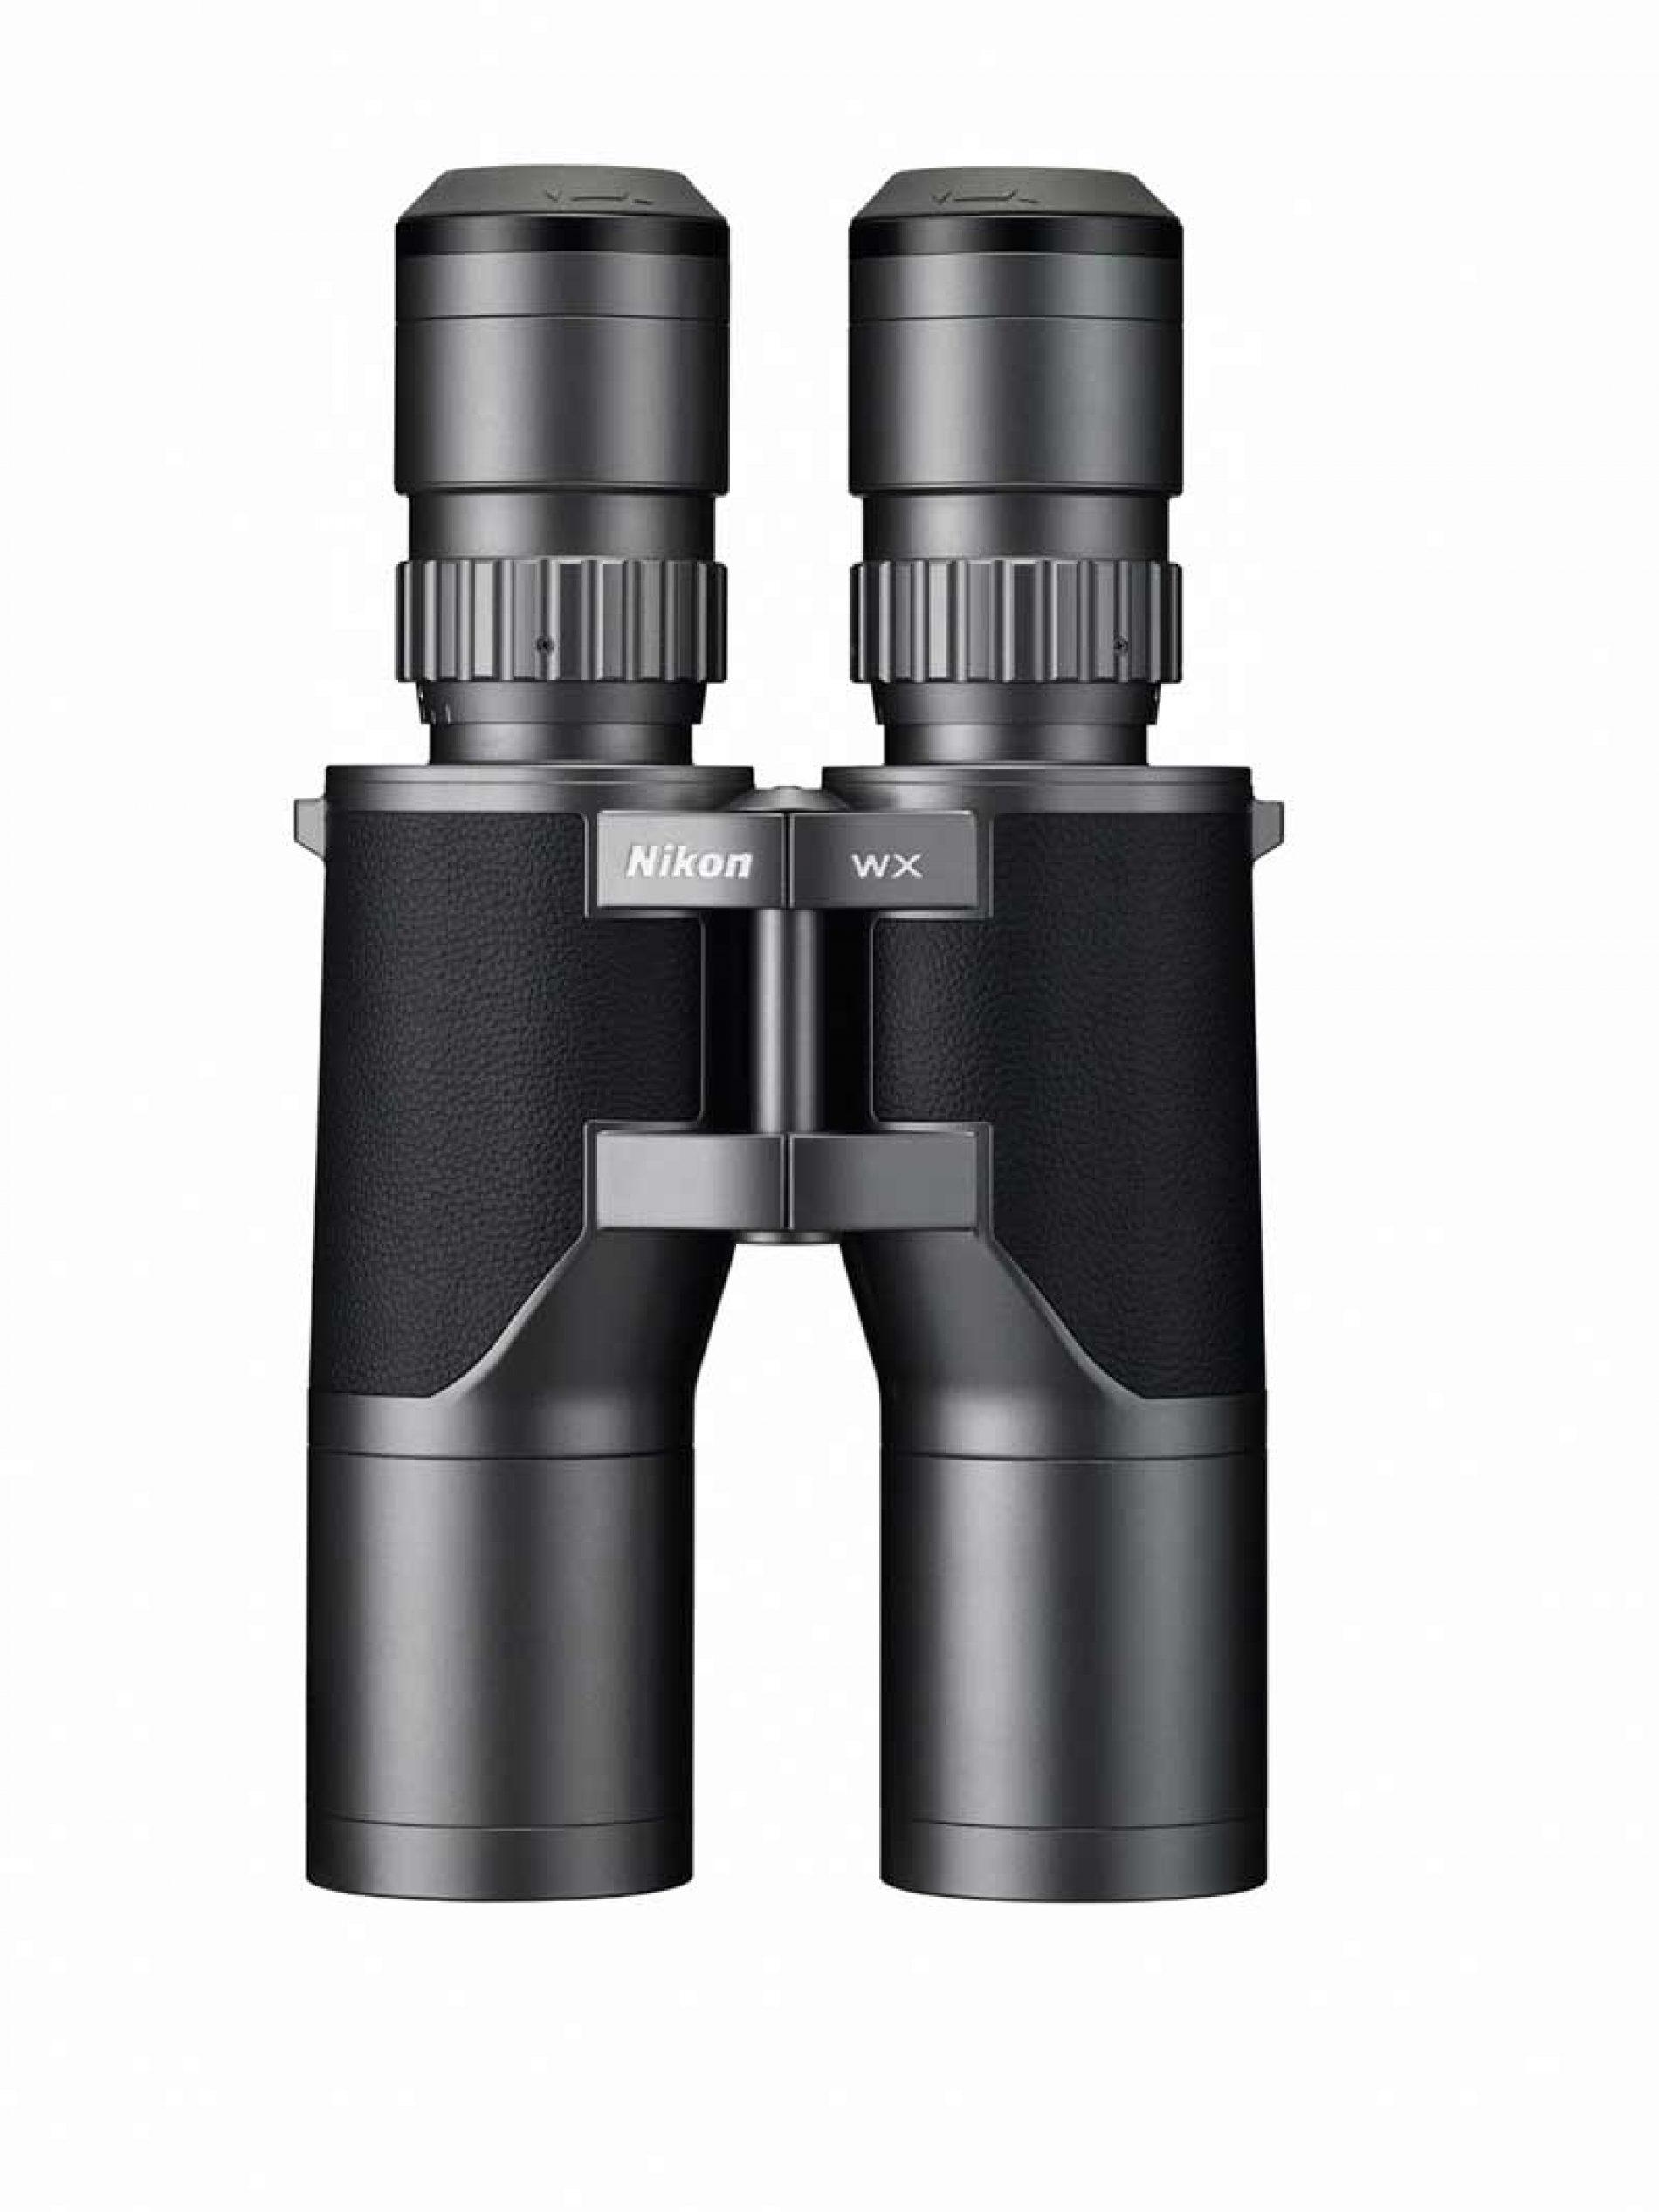 Nuevos binoculares Nikon WX